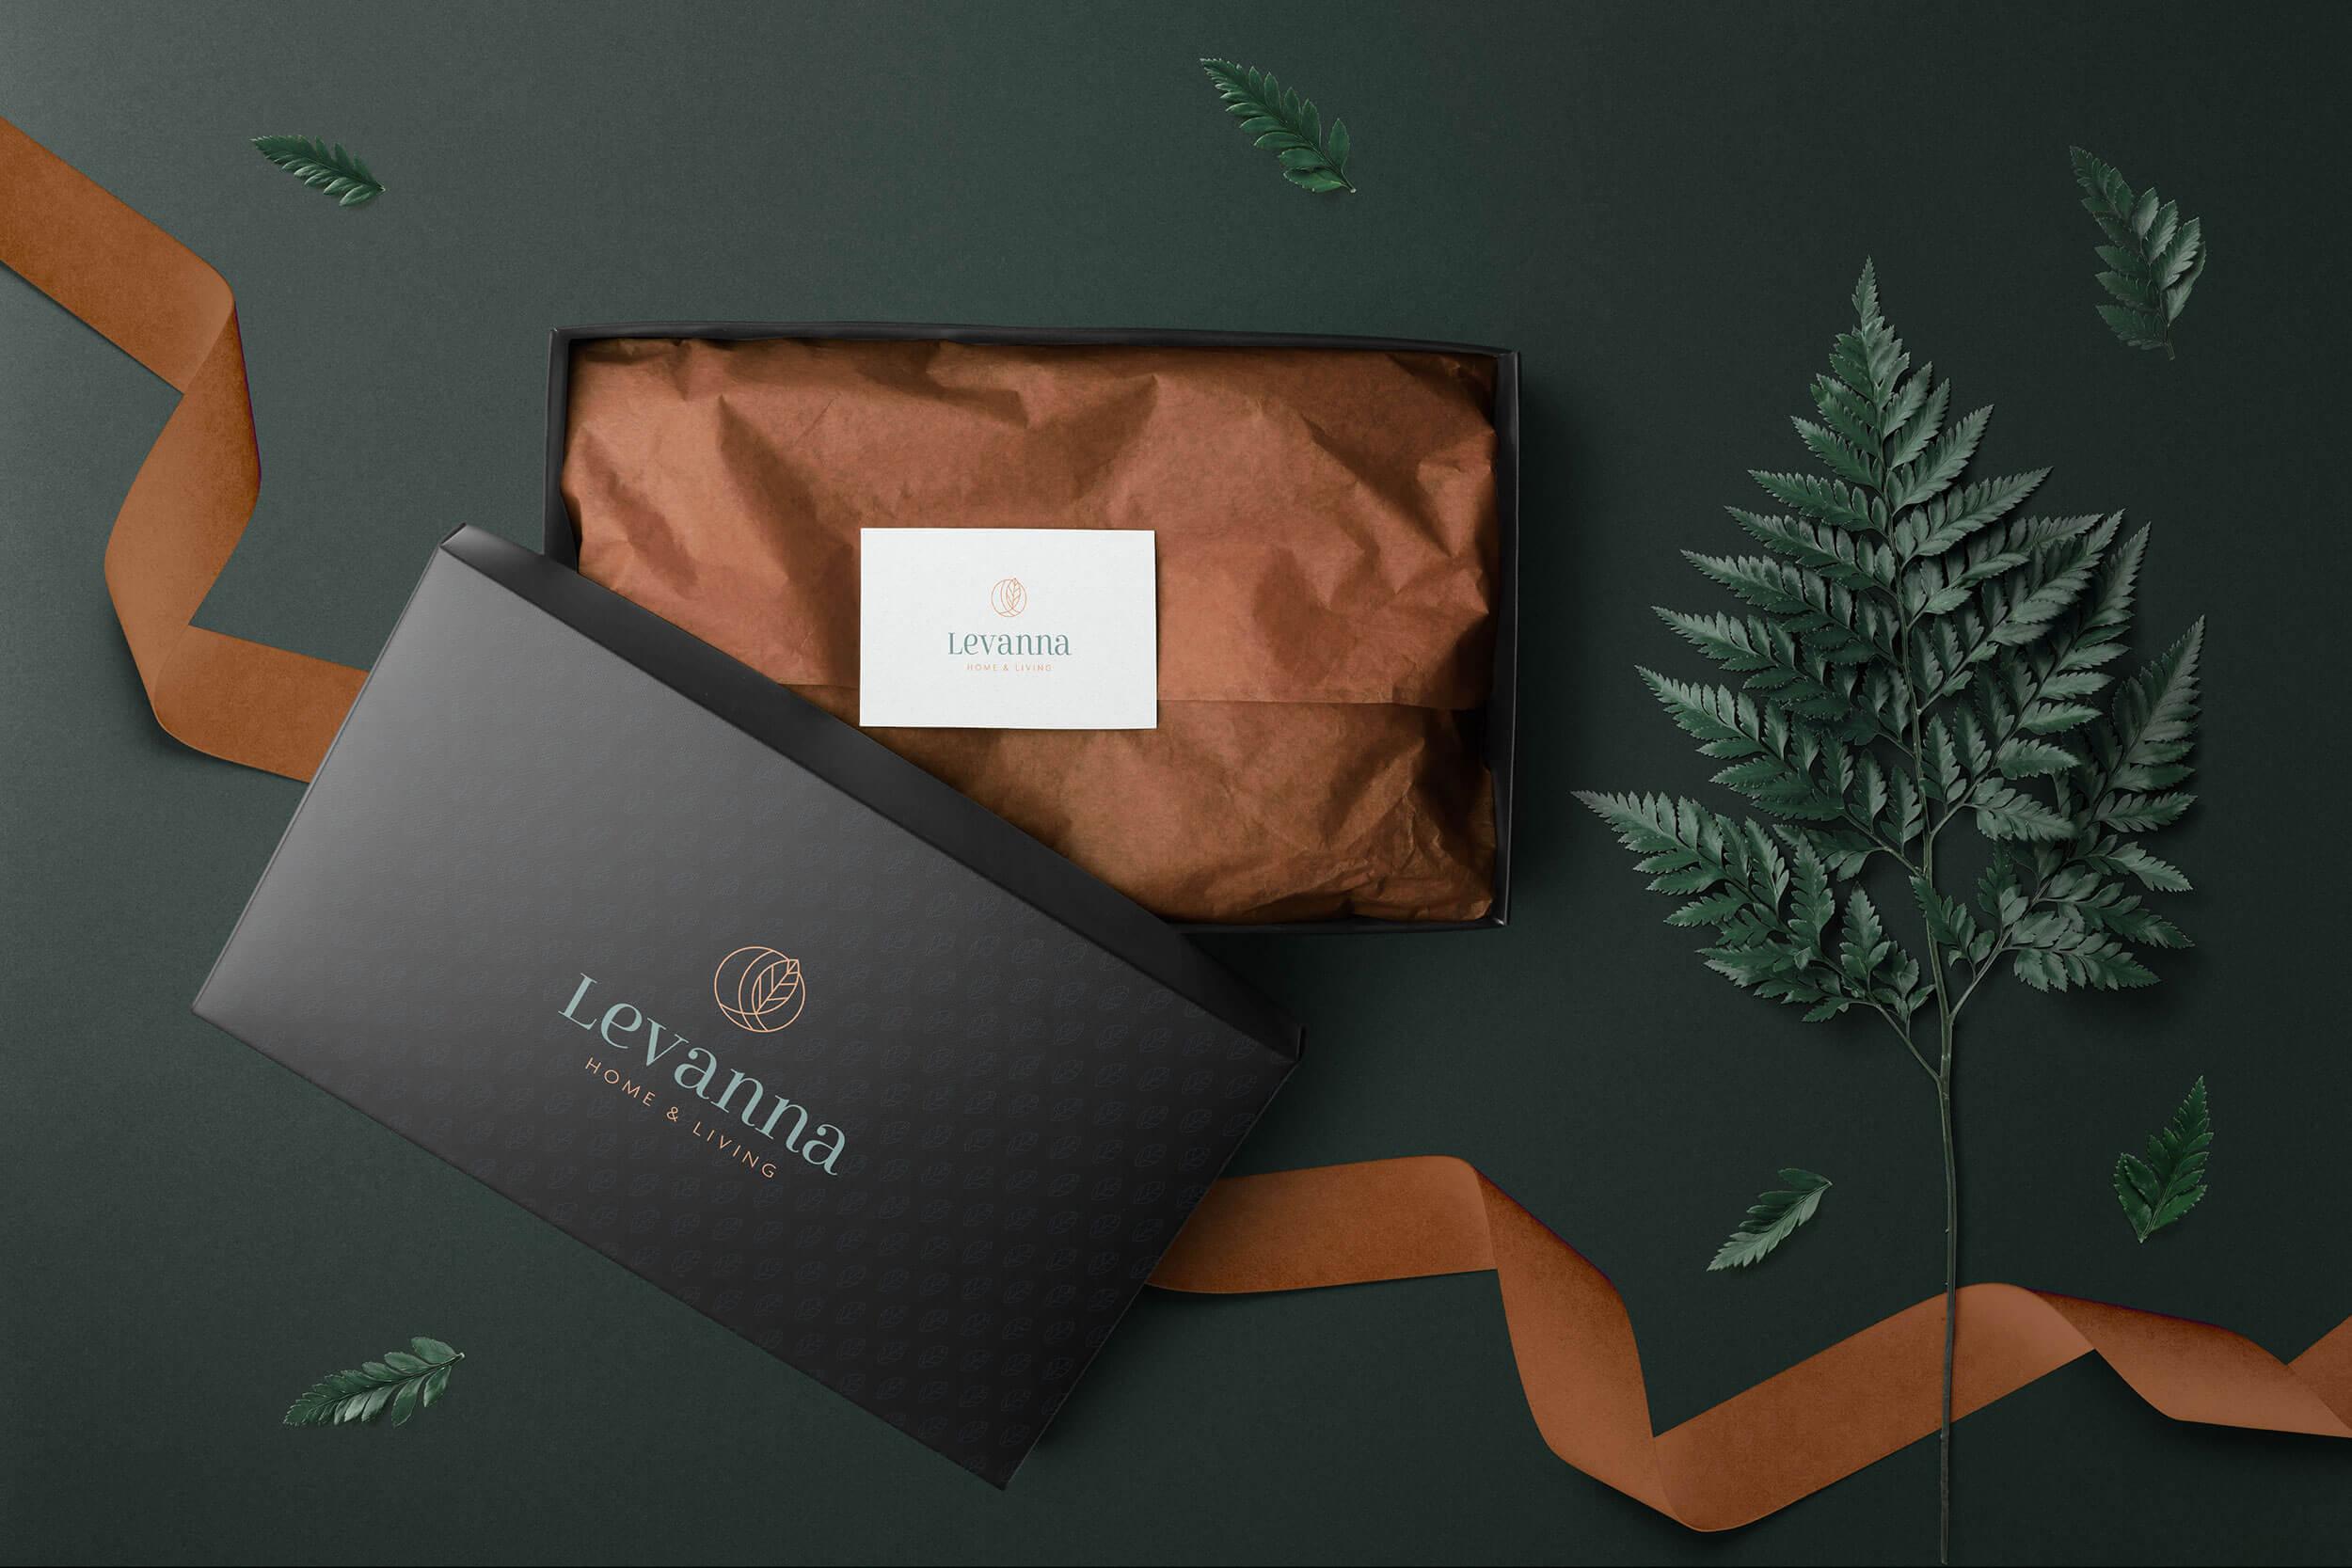 levanna_floral_box